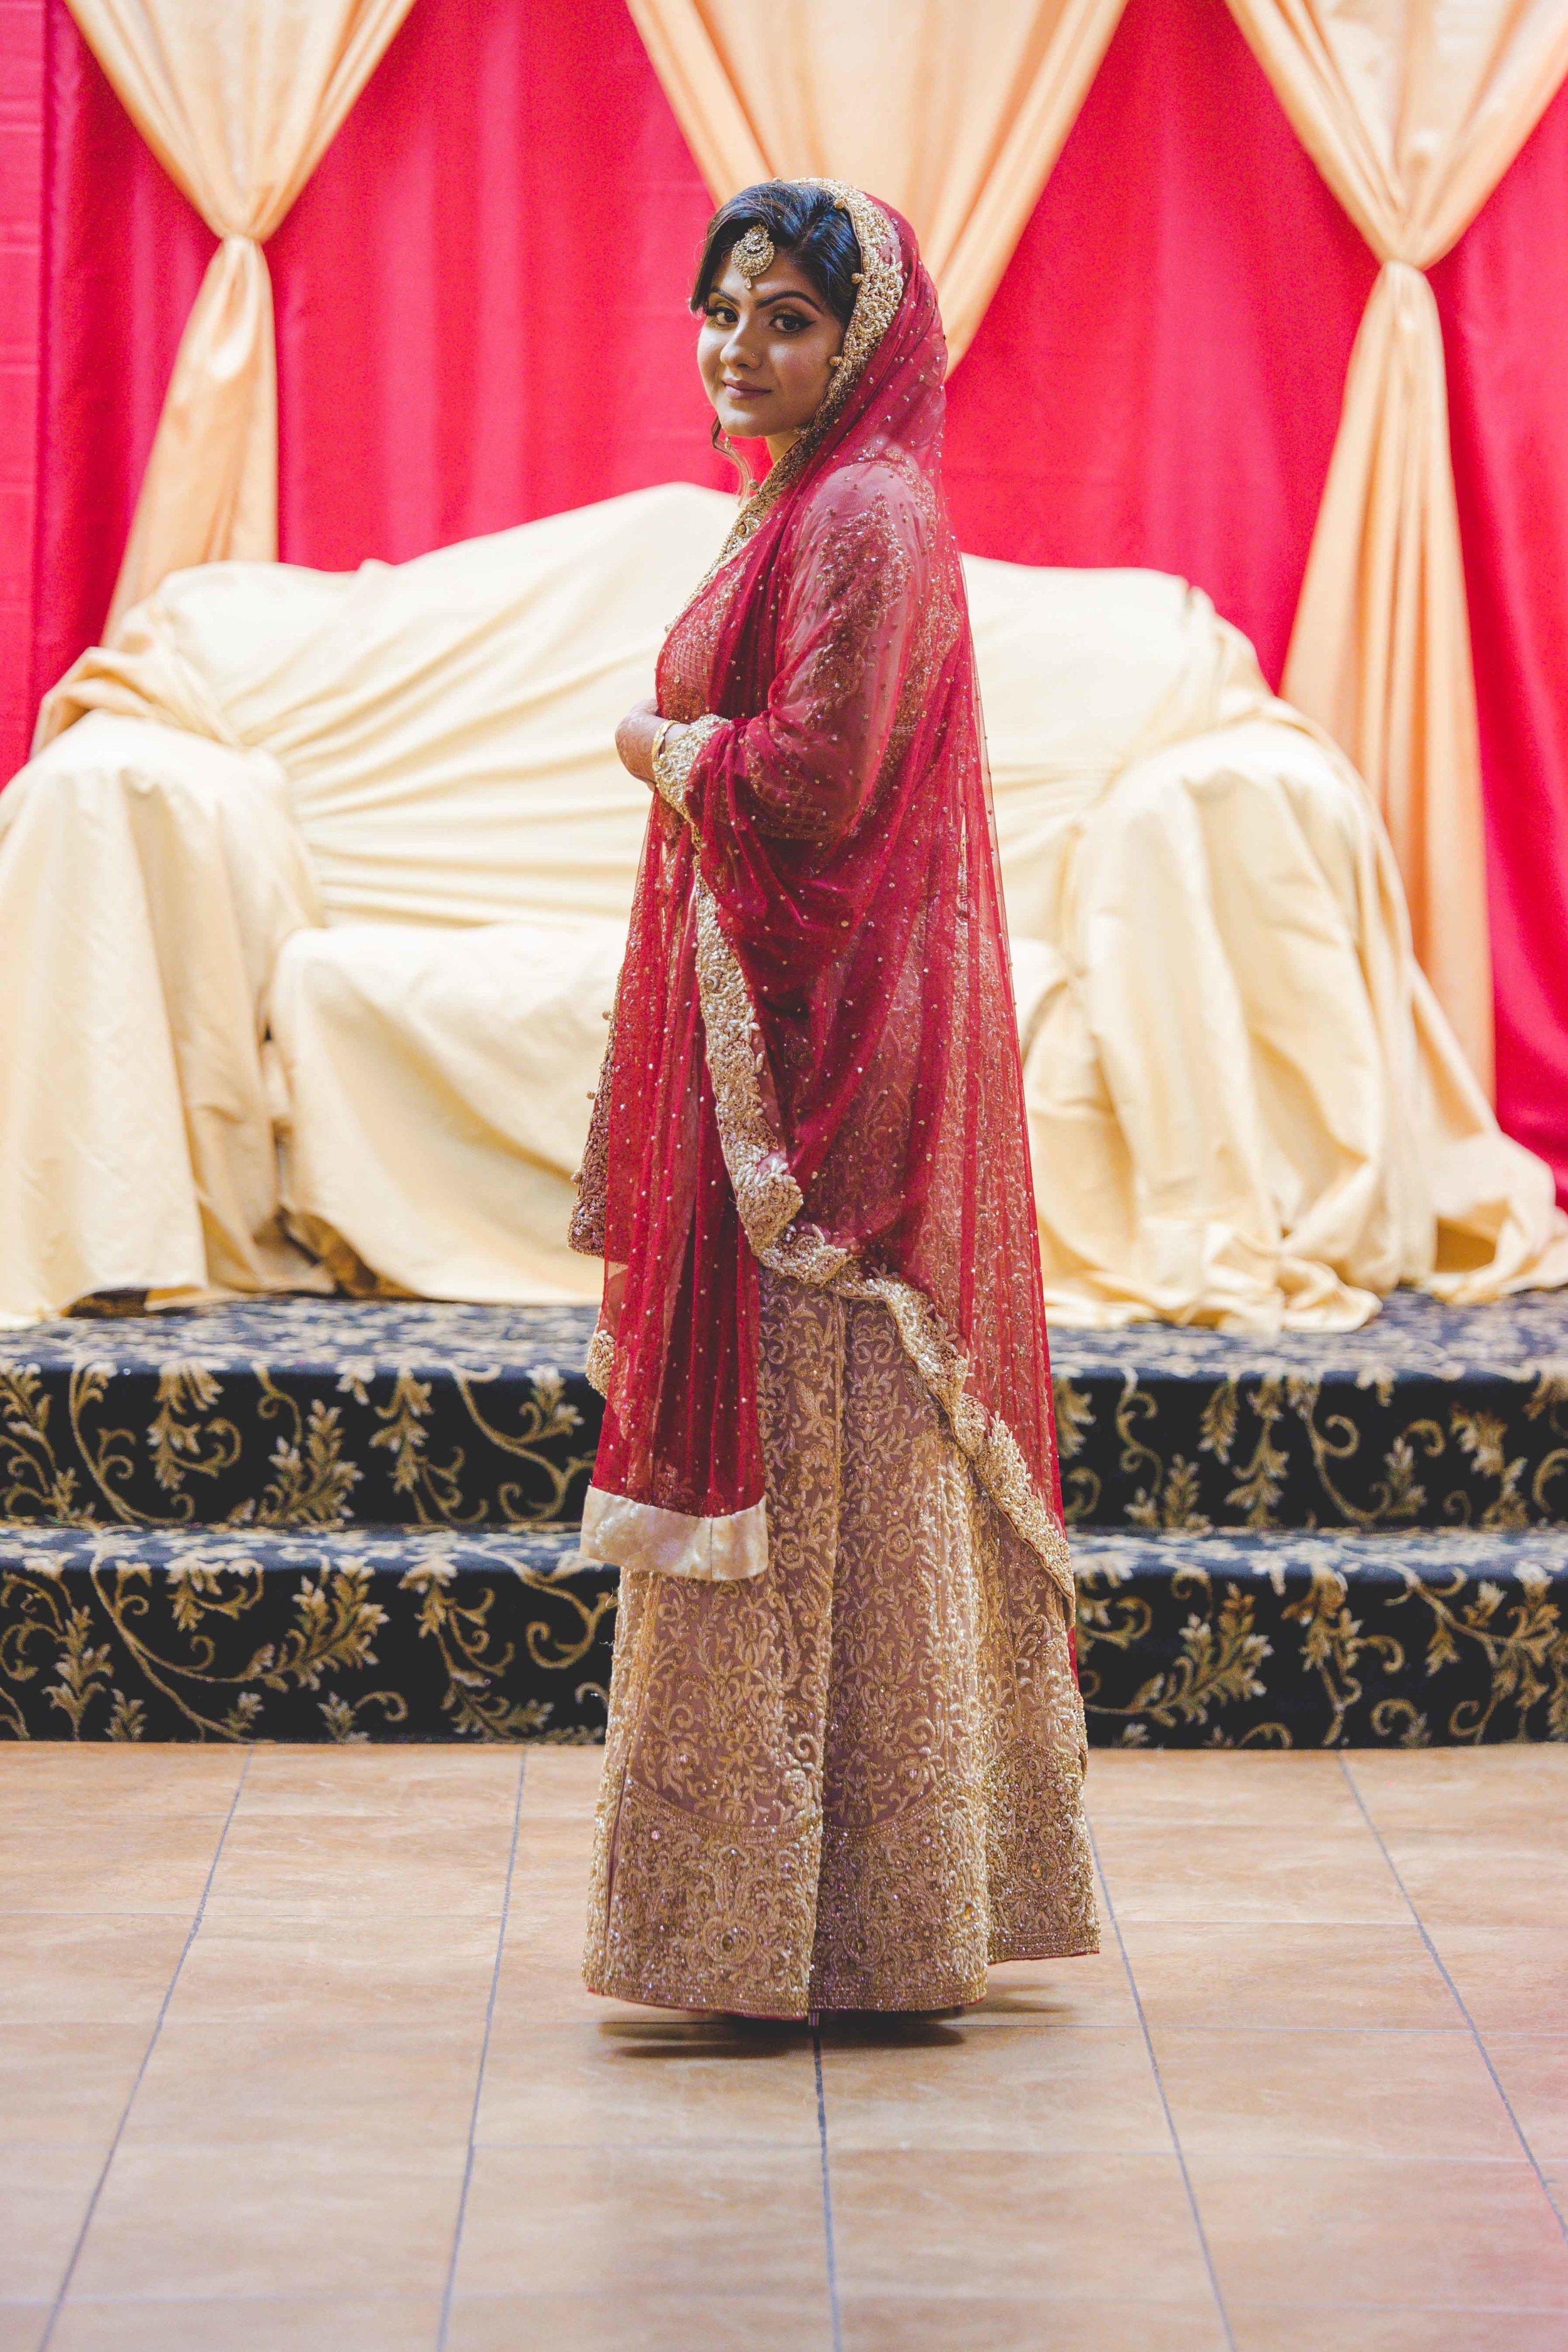 pakistani-wedding-photographer-brooklyn-new-york-6.jpg